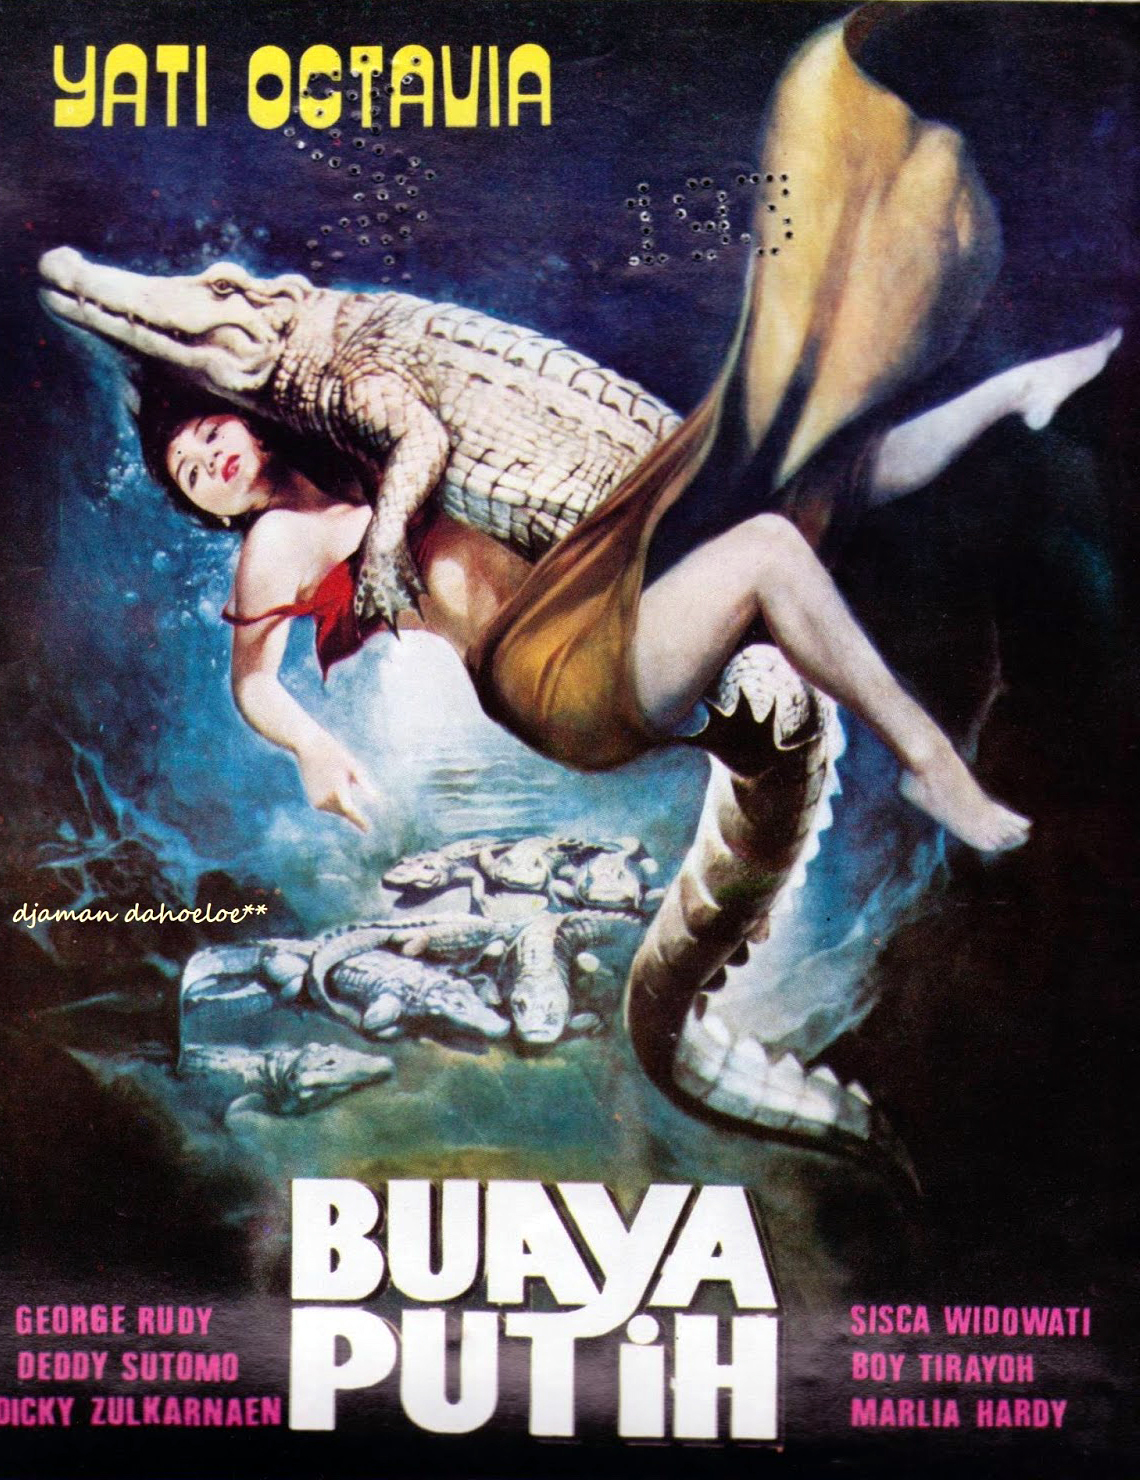 Buaya Putih ((1982))